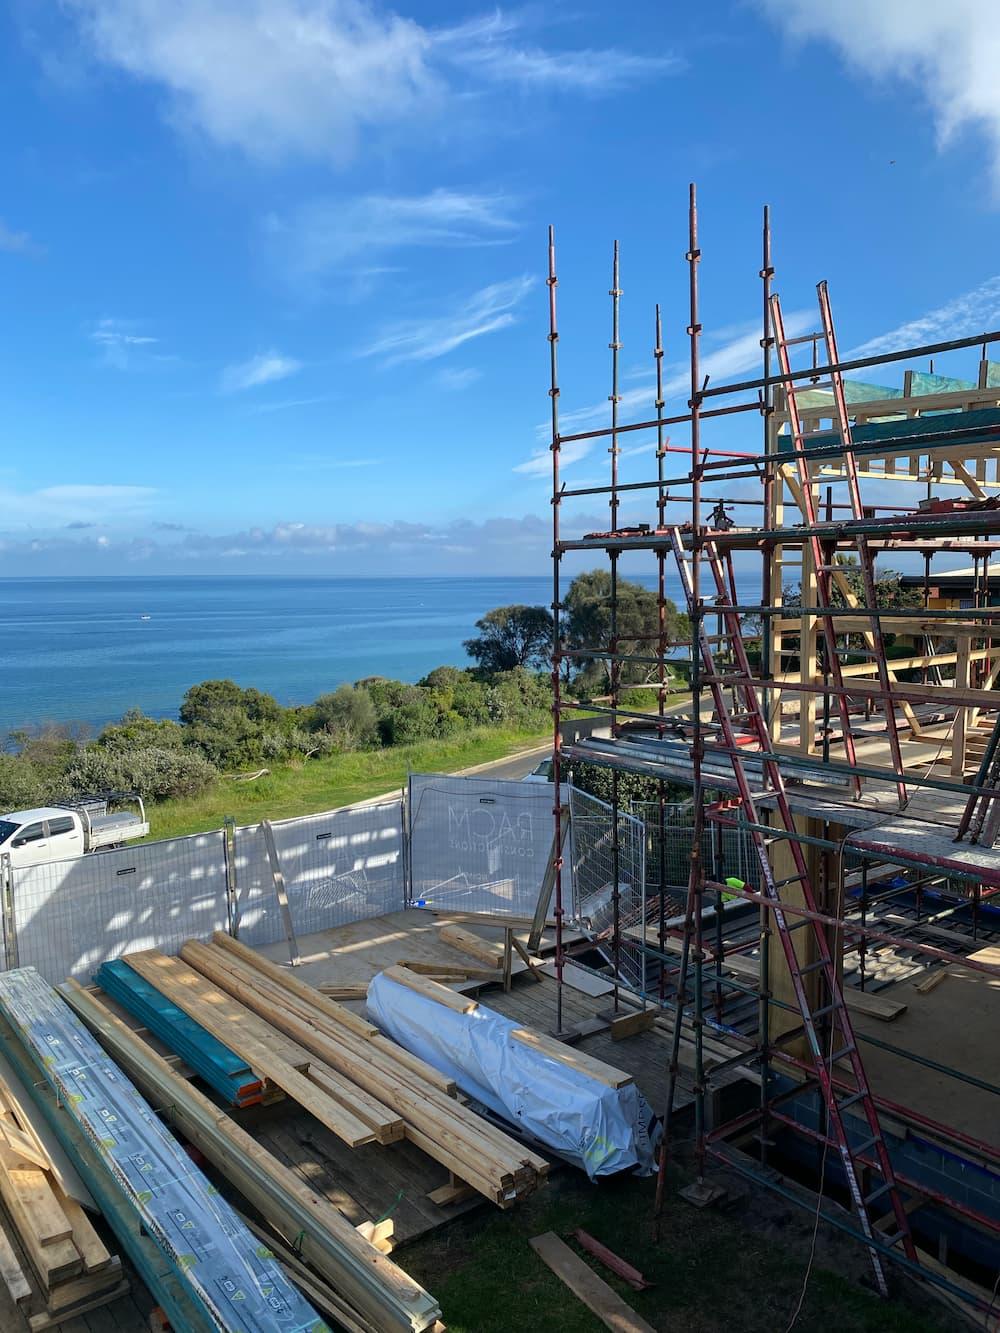 Residential multi storey scaffolding at beach